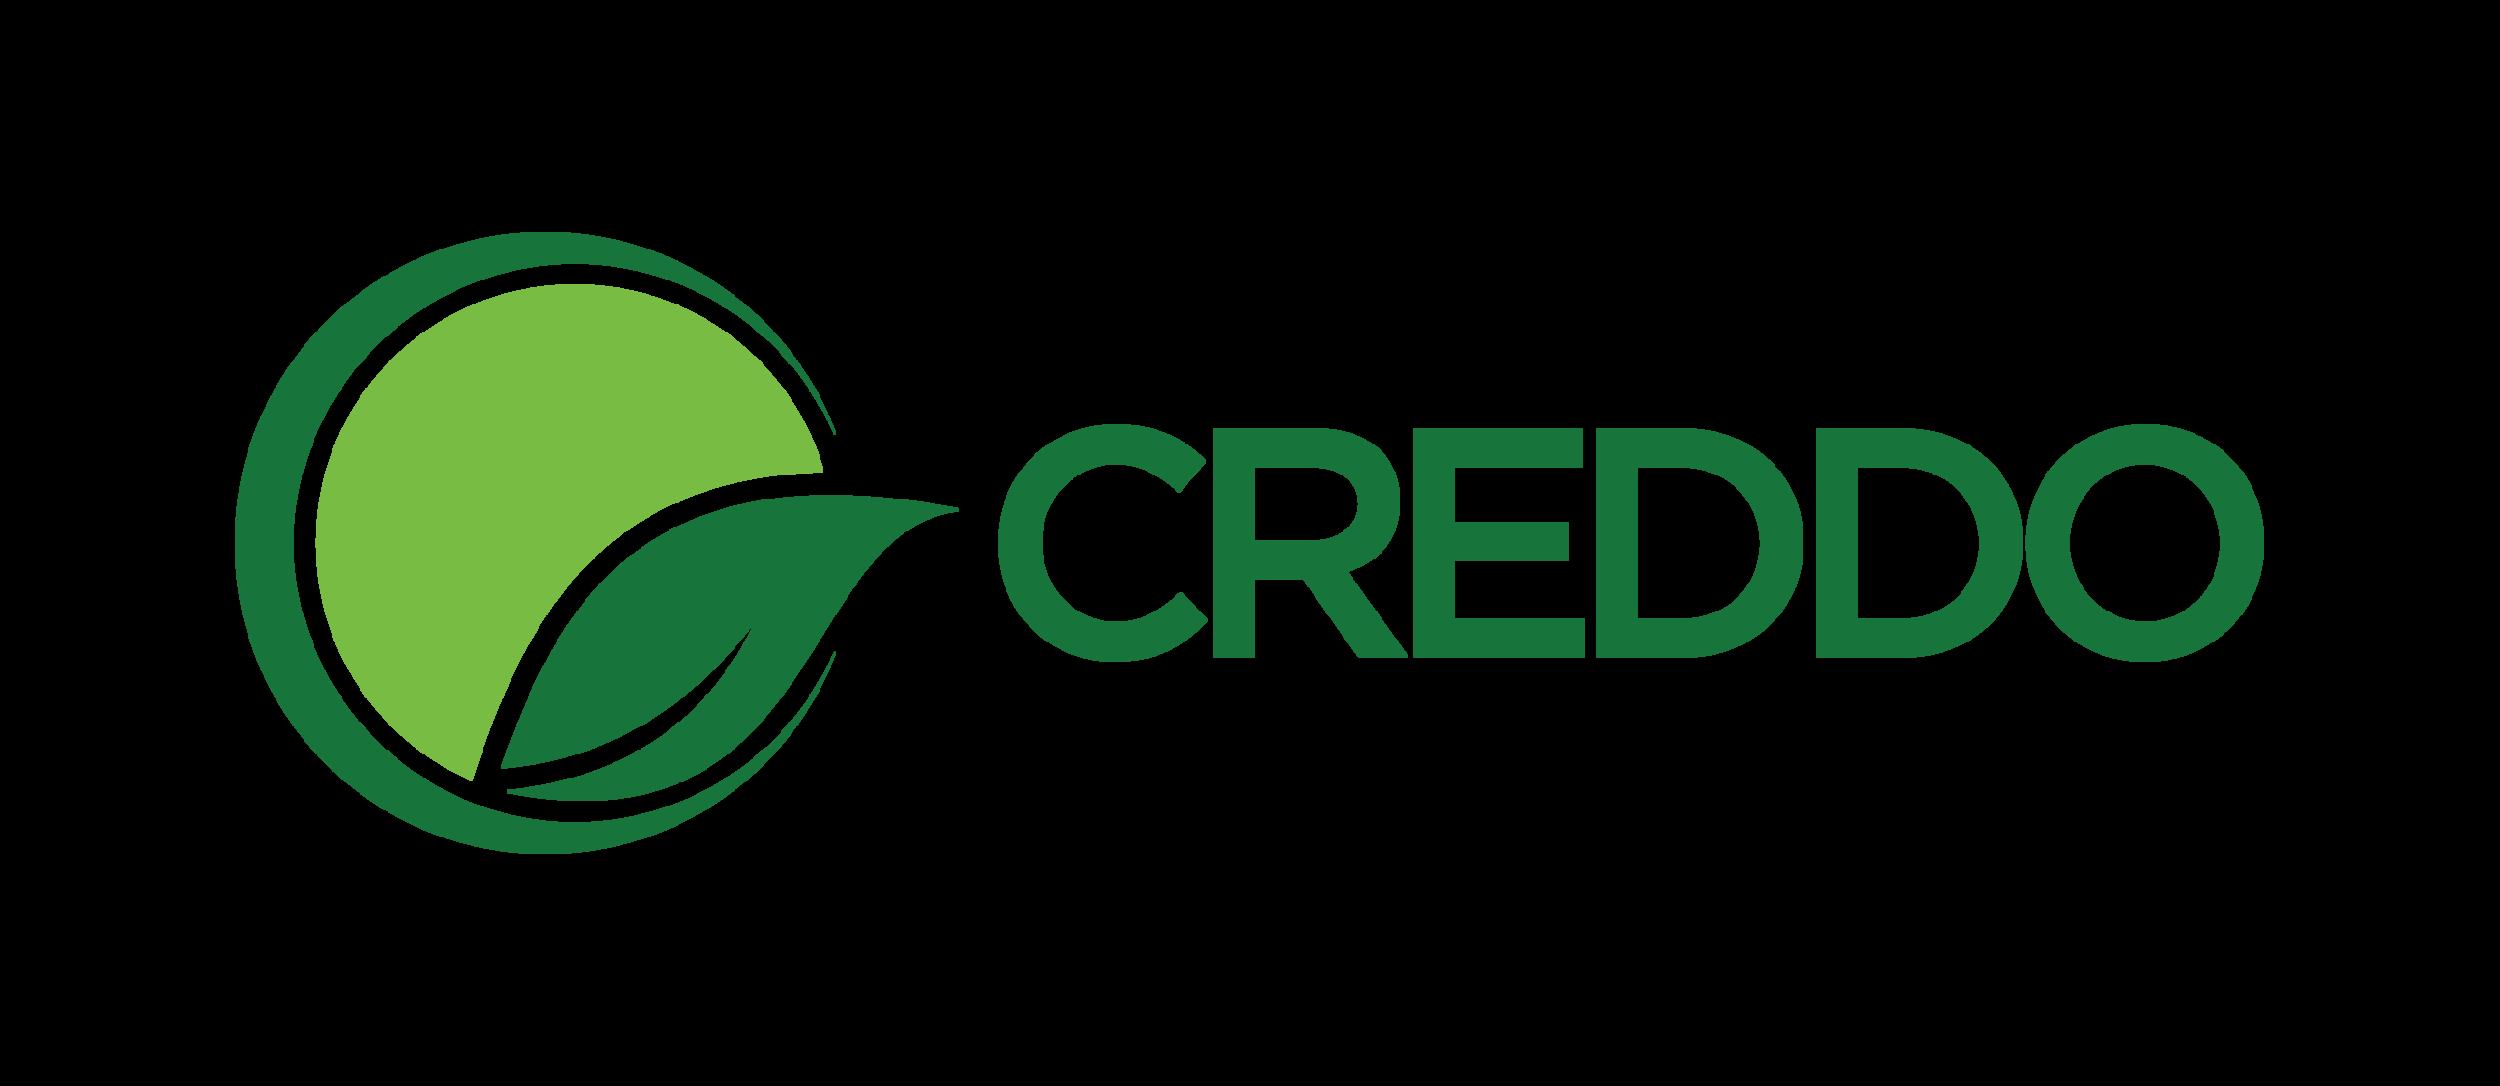 Creddo Logo V - rgb.png